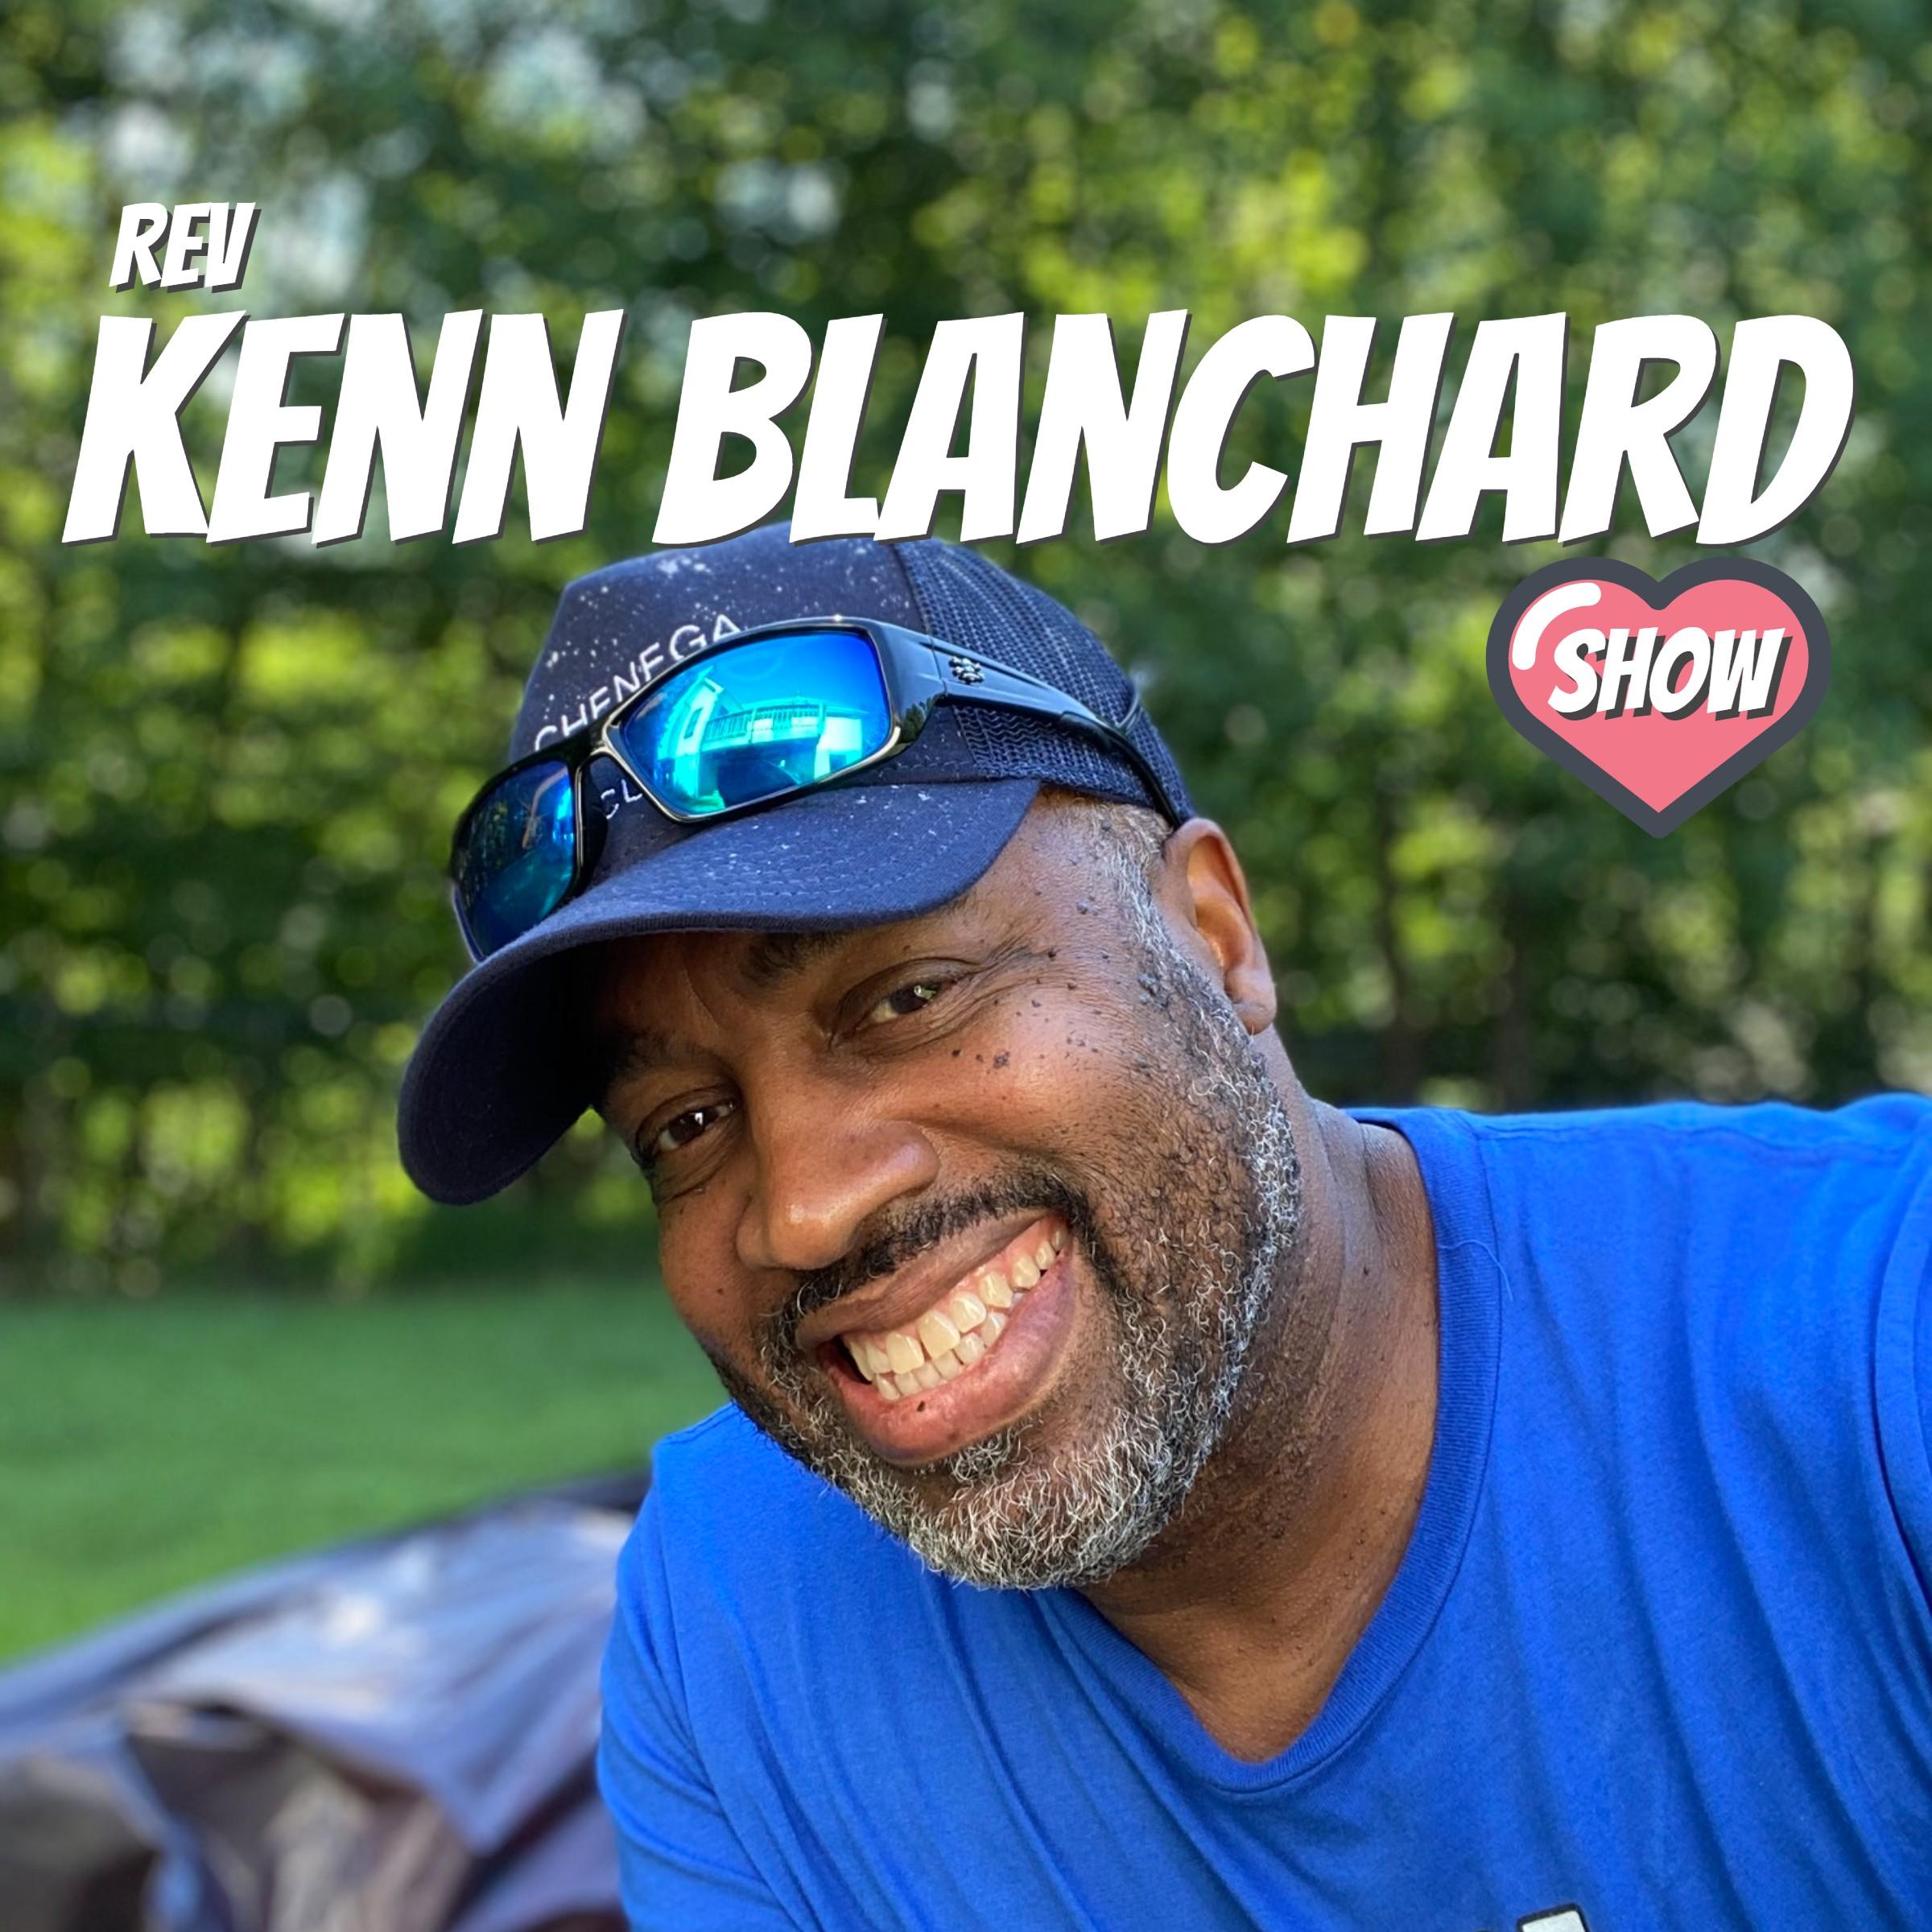 Rev Kenn Blanchard Show show art